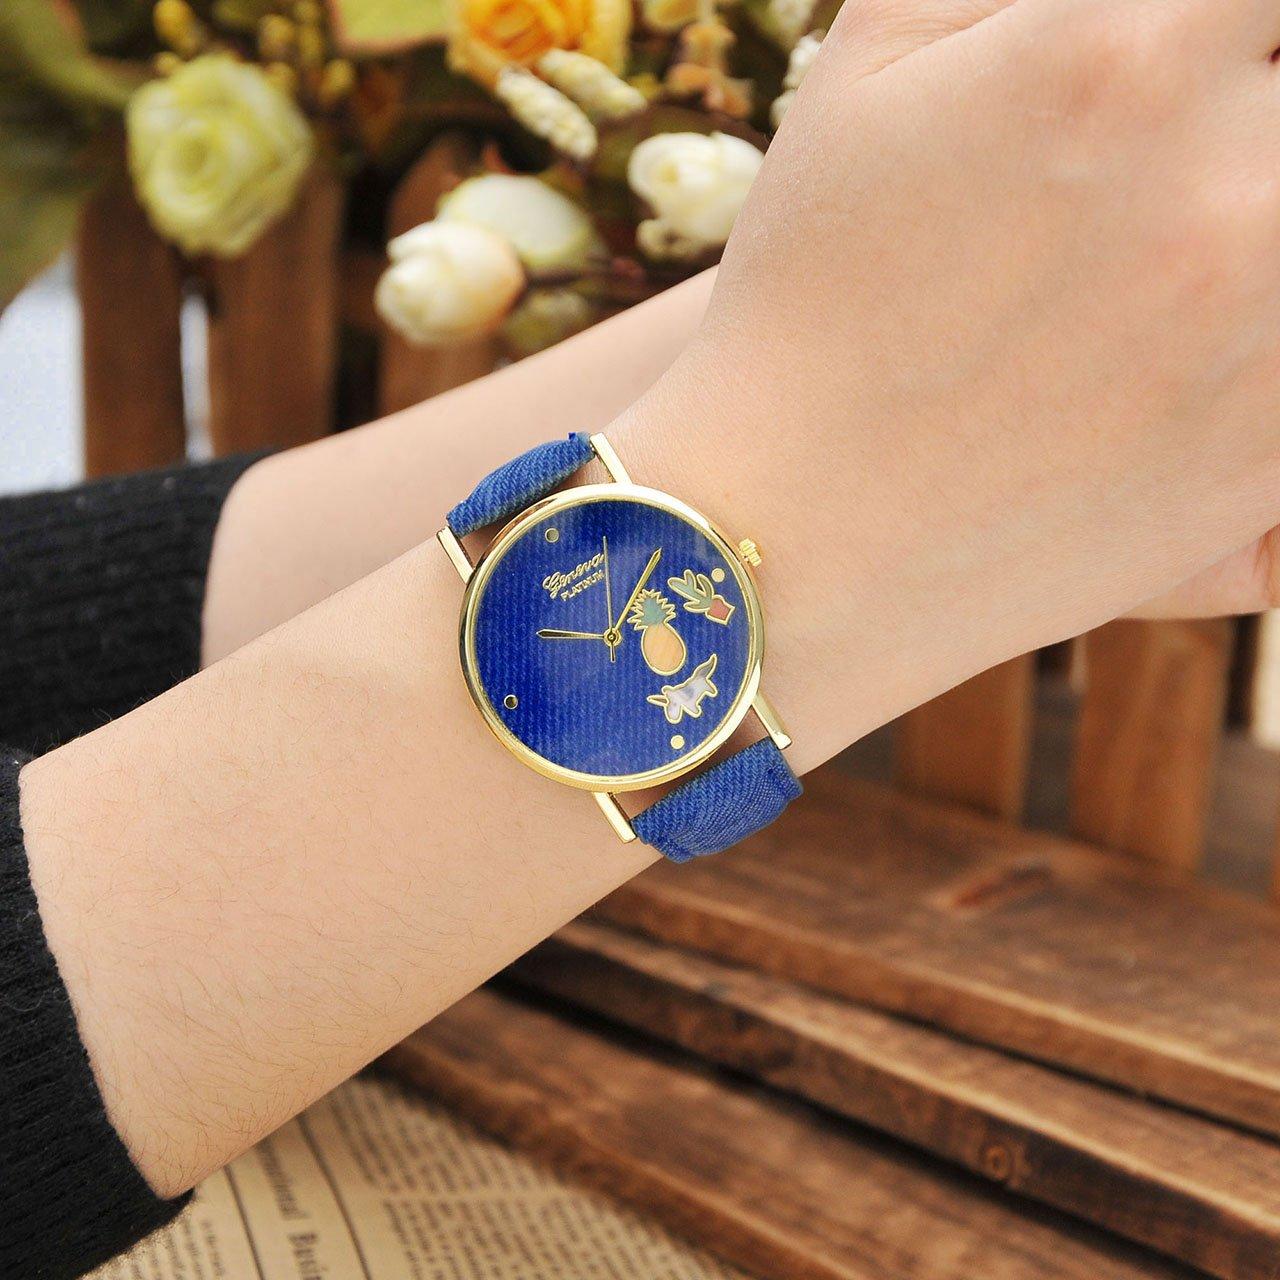 JSDDE Uhren,Fashion Cute Cartoon Einhorn Ananas Kaktus Armbanduhr Denim PU Lederband Damenuhr Kleid Quarz Uhr,Dunkelblau